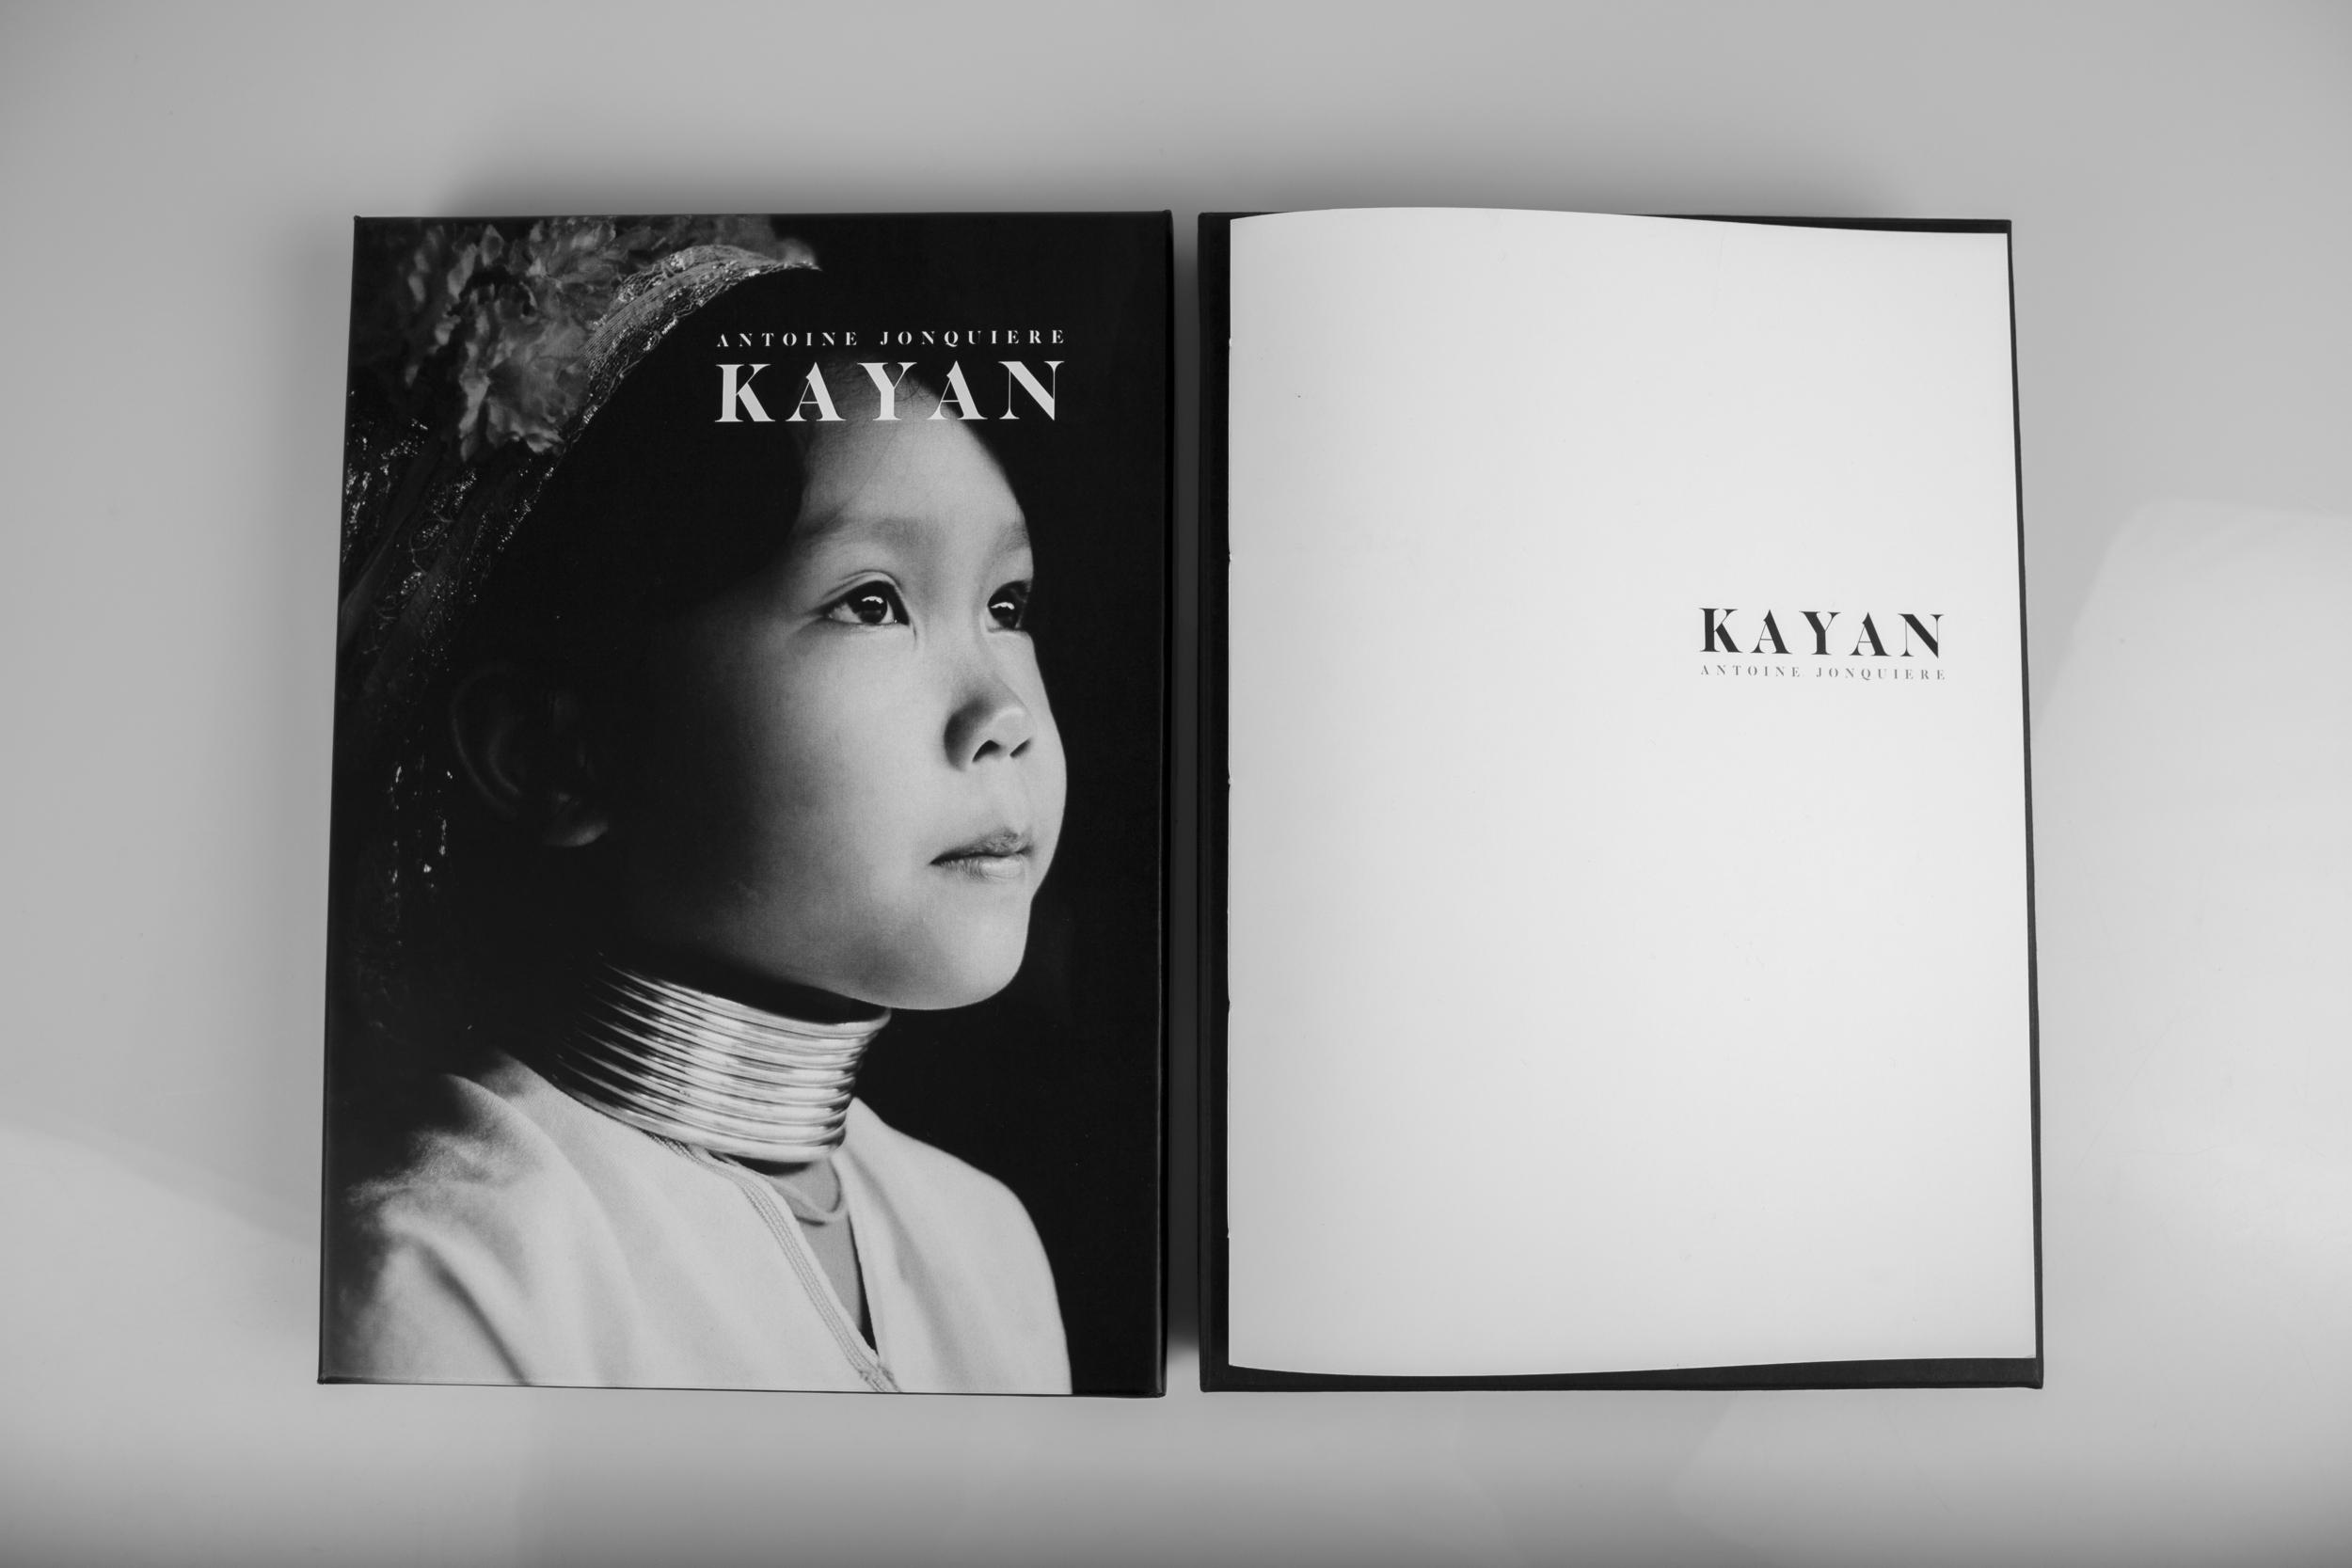 Kayan_7.jpg